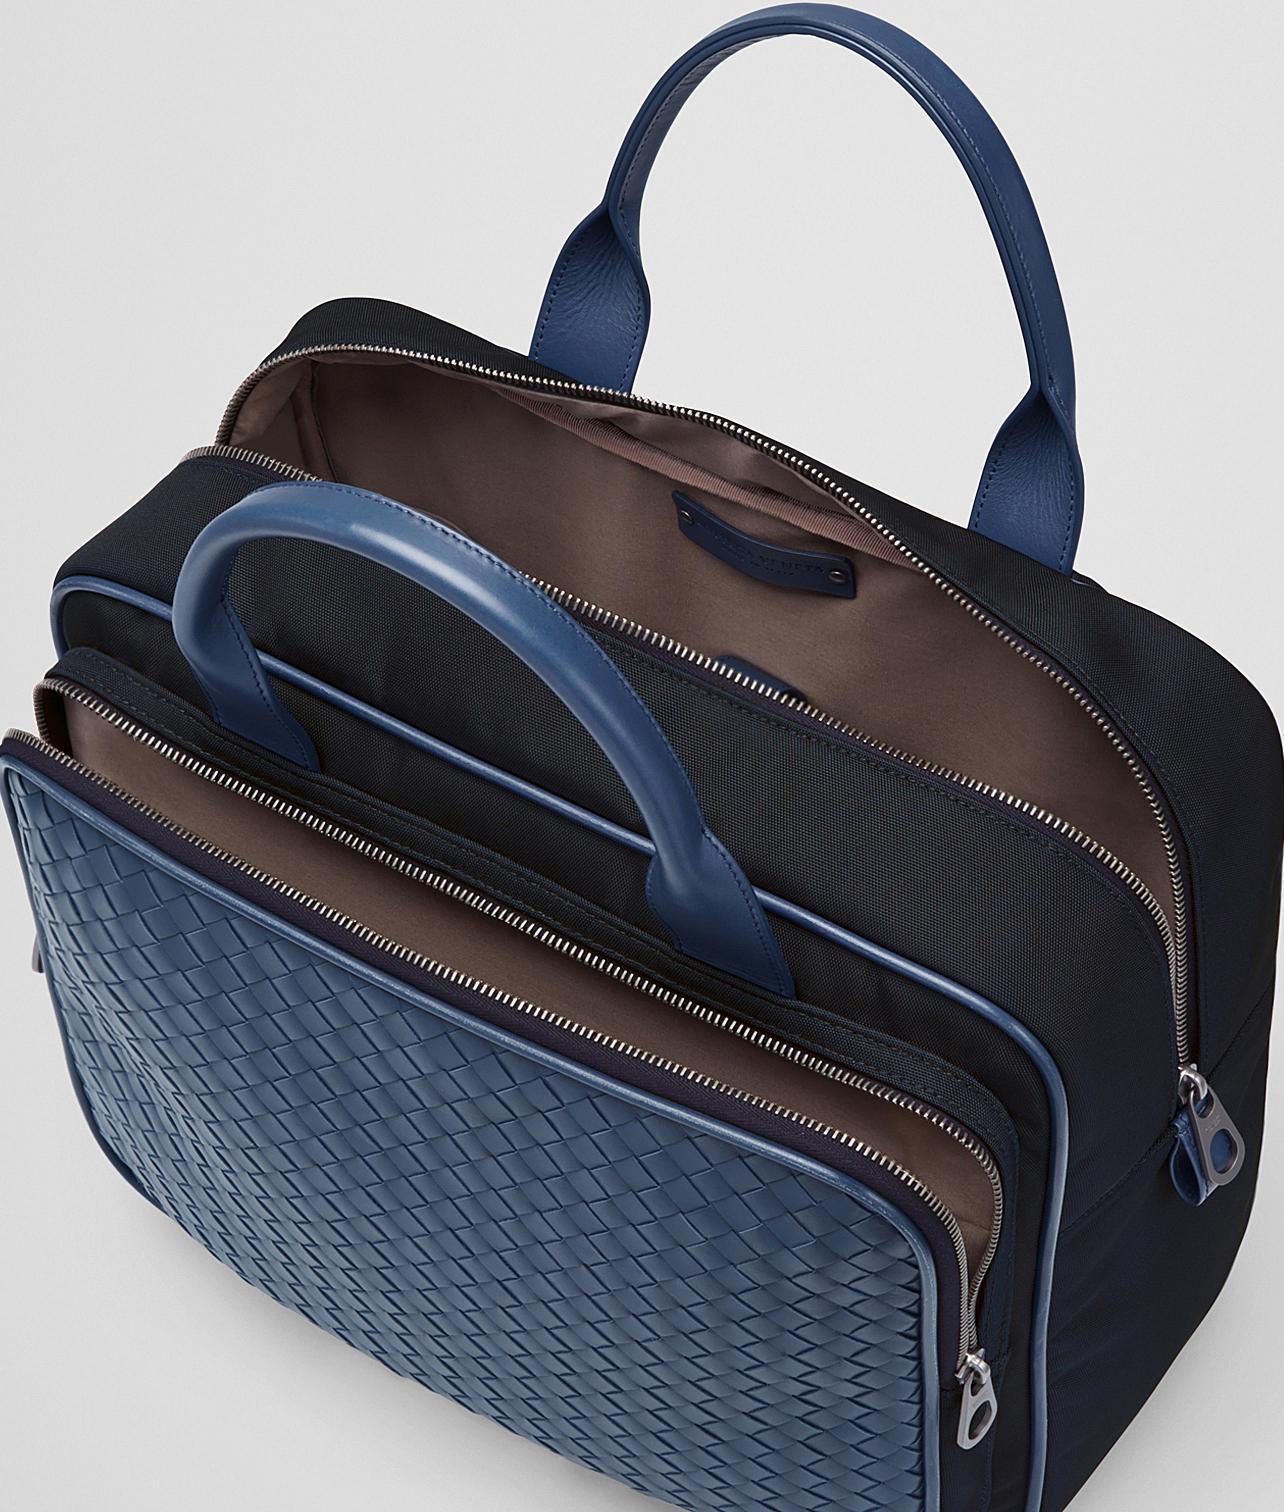 d8ee40334f49 Bottega Veneta - Blue Travel Bag In Tourmaline Technical Canvas And Pacific  Intrecciato Calf - Lyst. View fullscreen